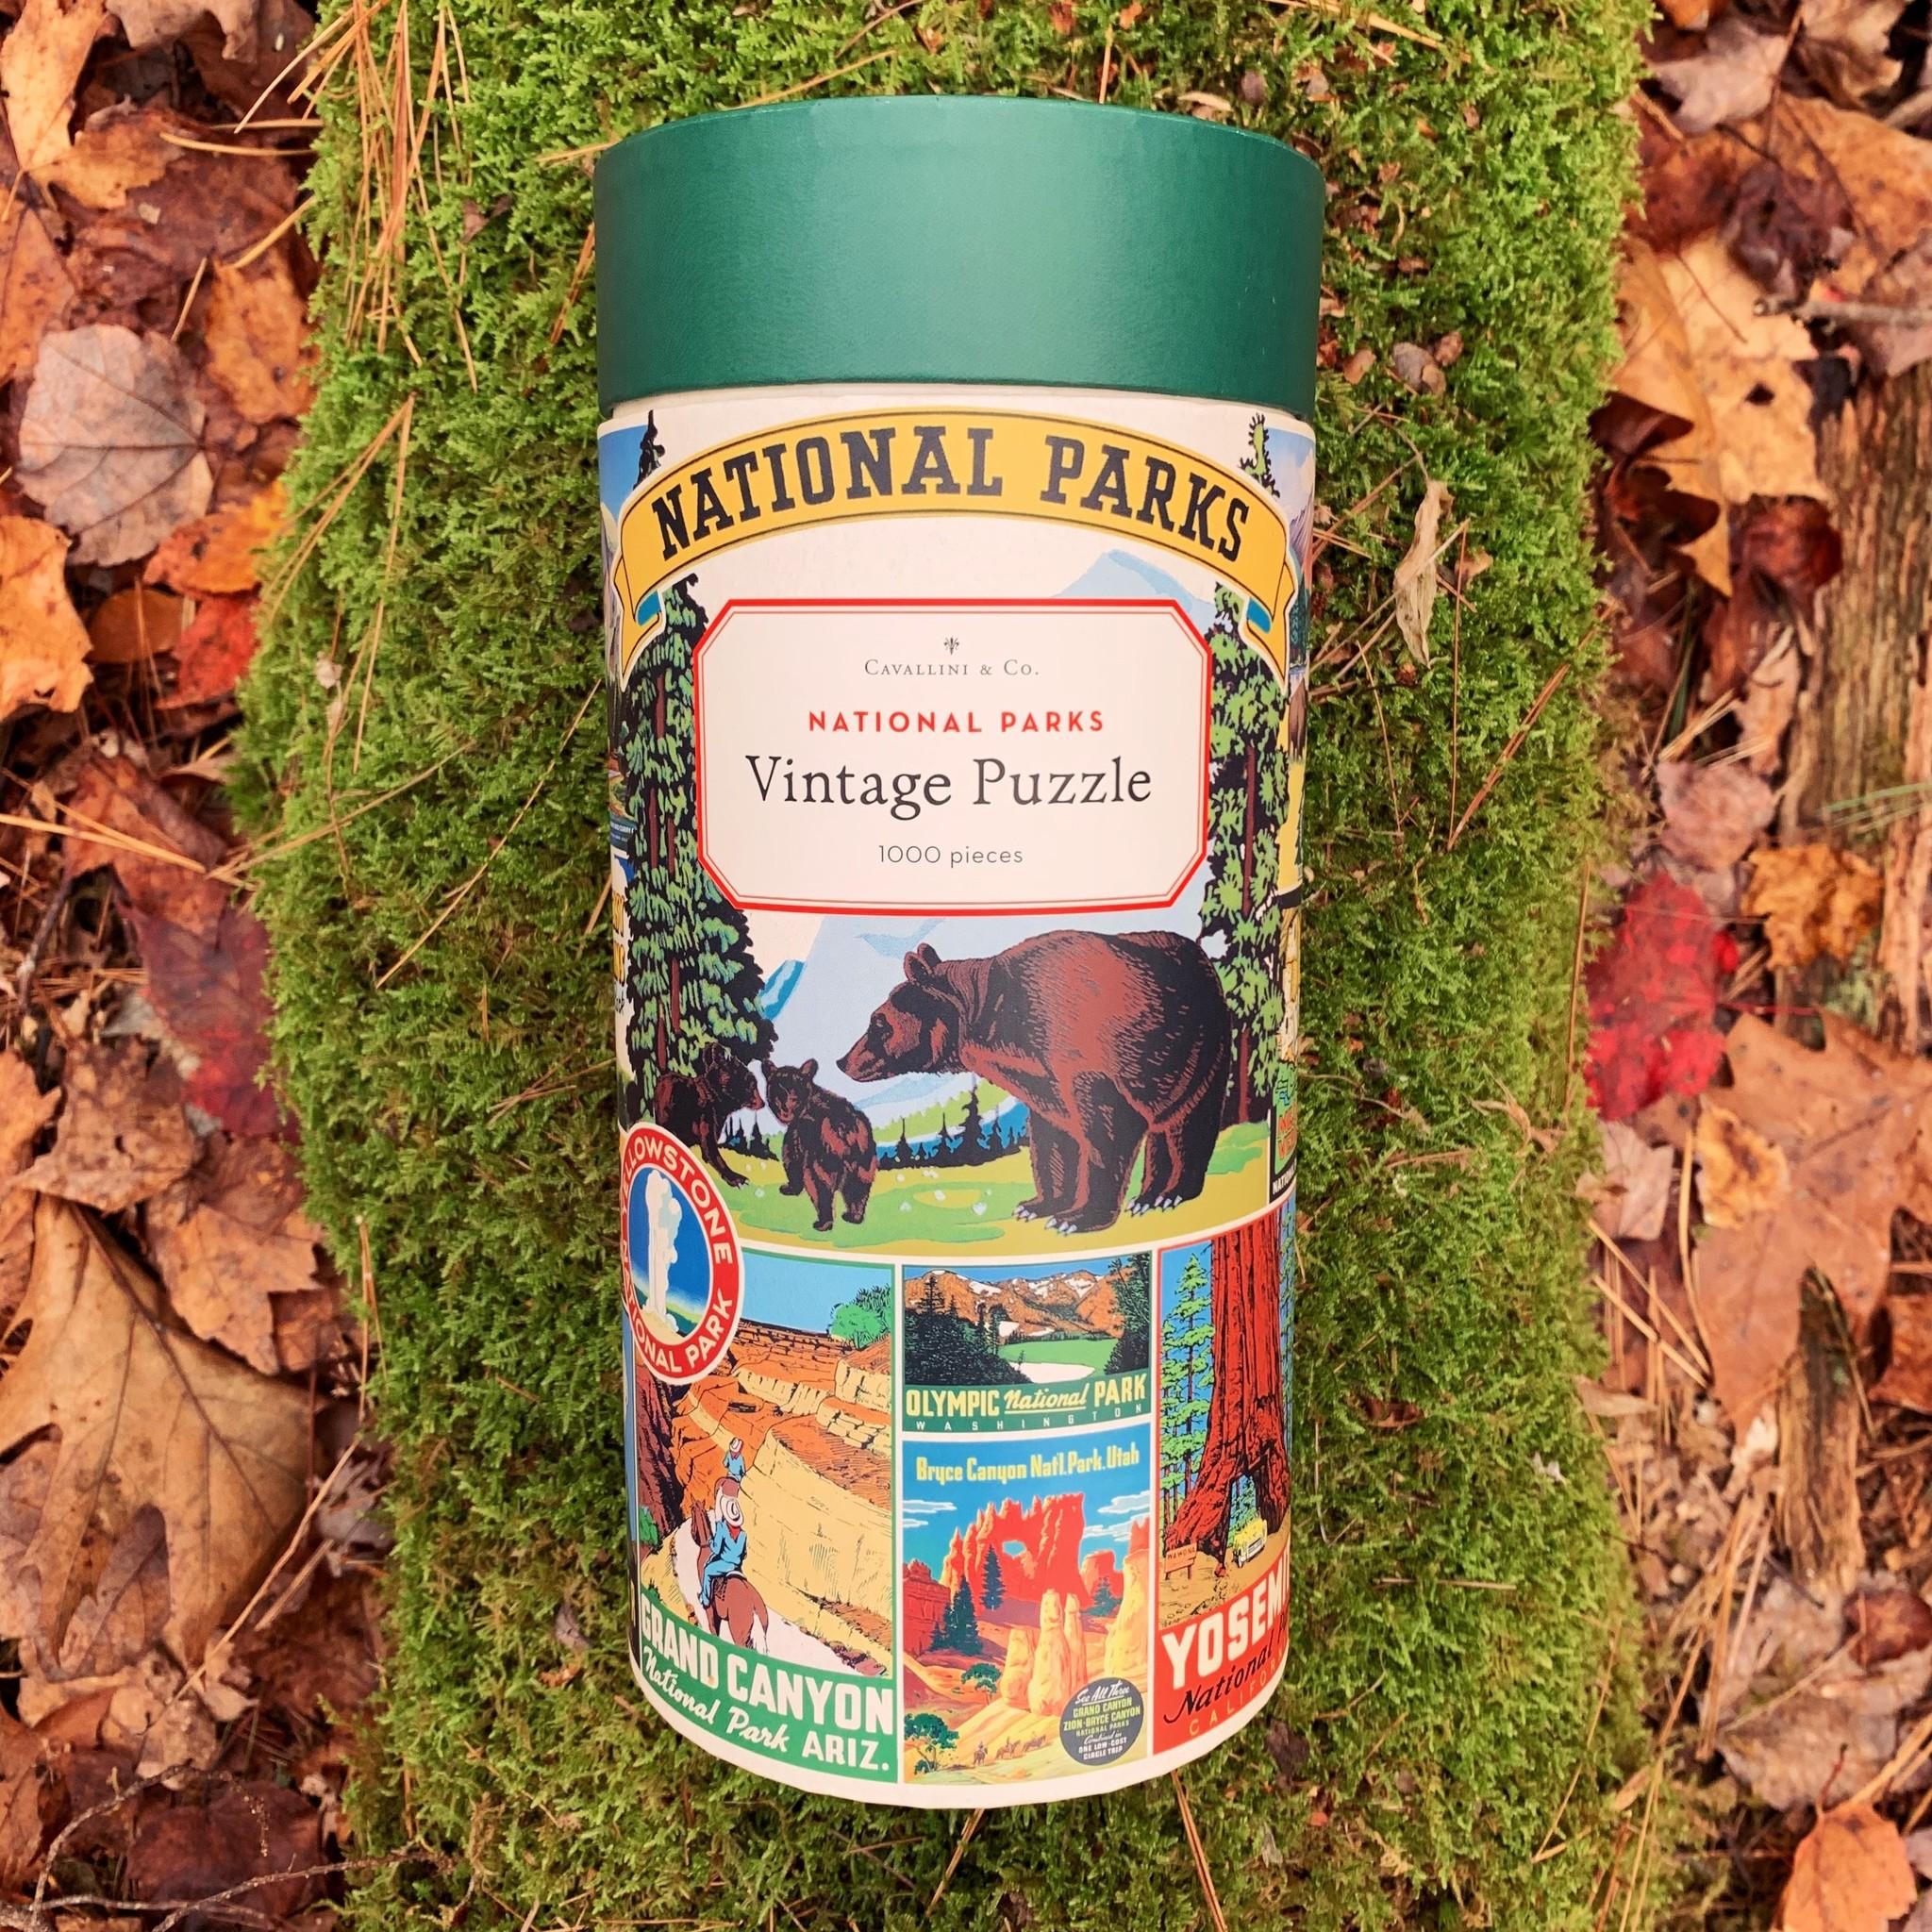 Cavallini Jigsaw Puzzle - National Parks - 1000 Pieces